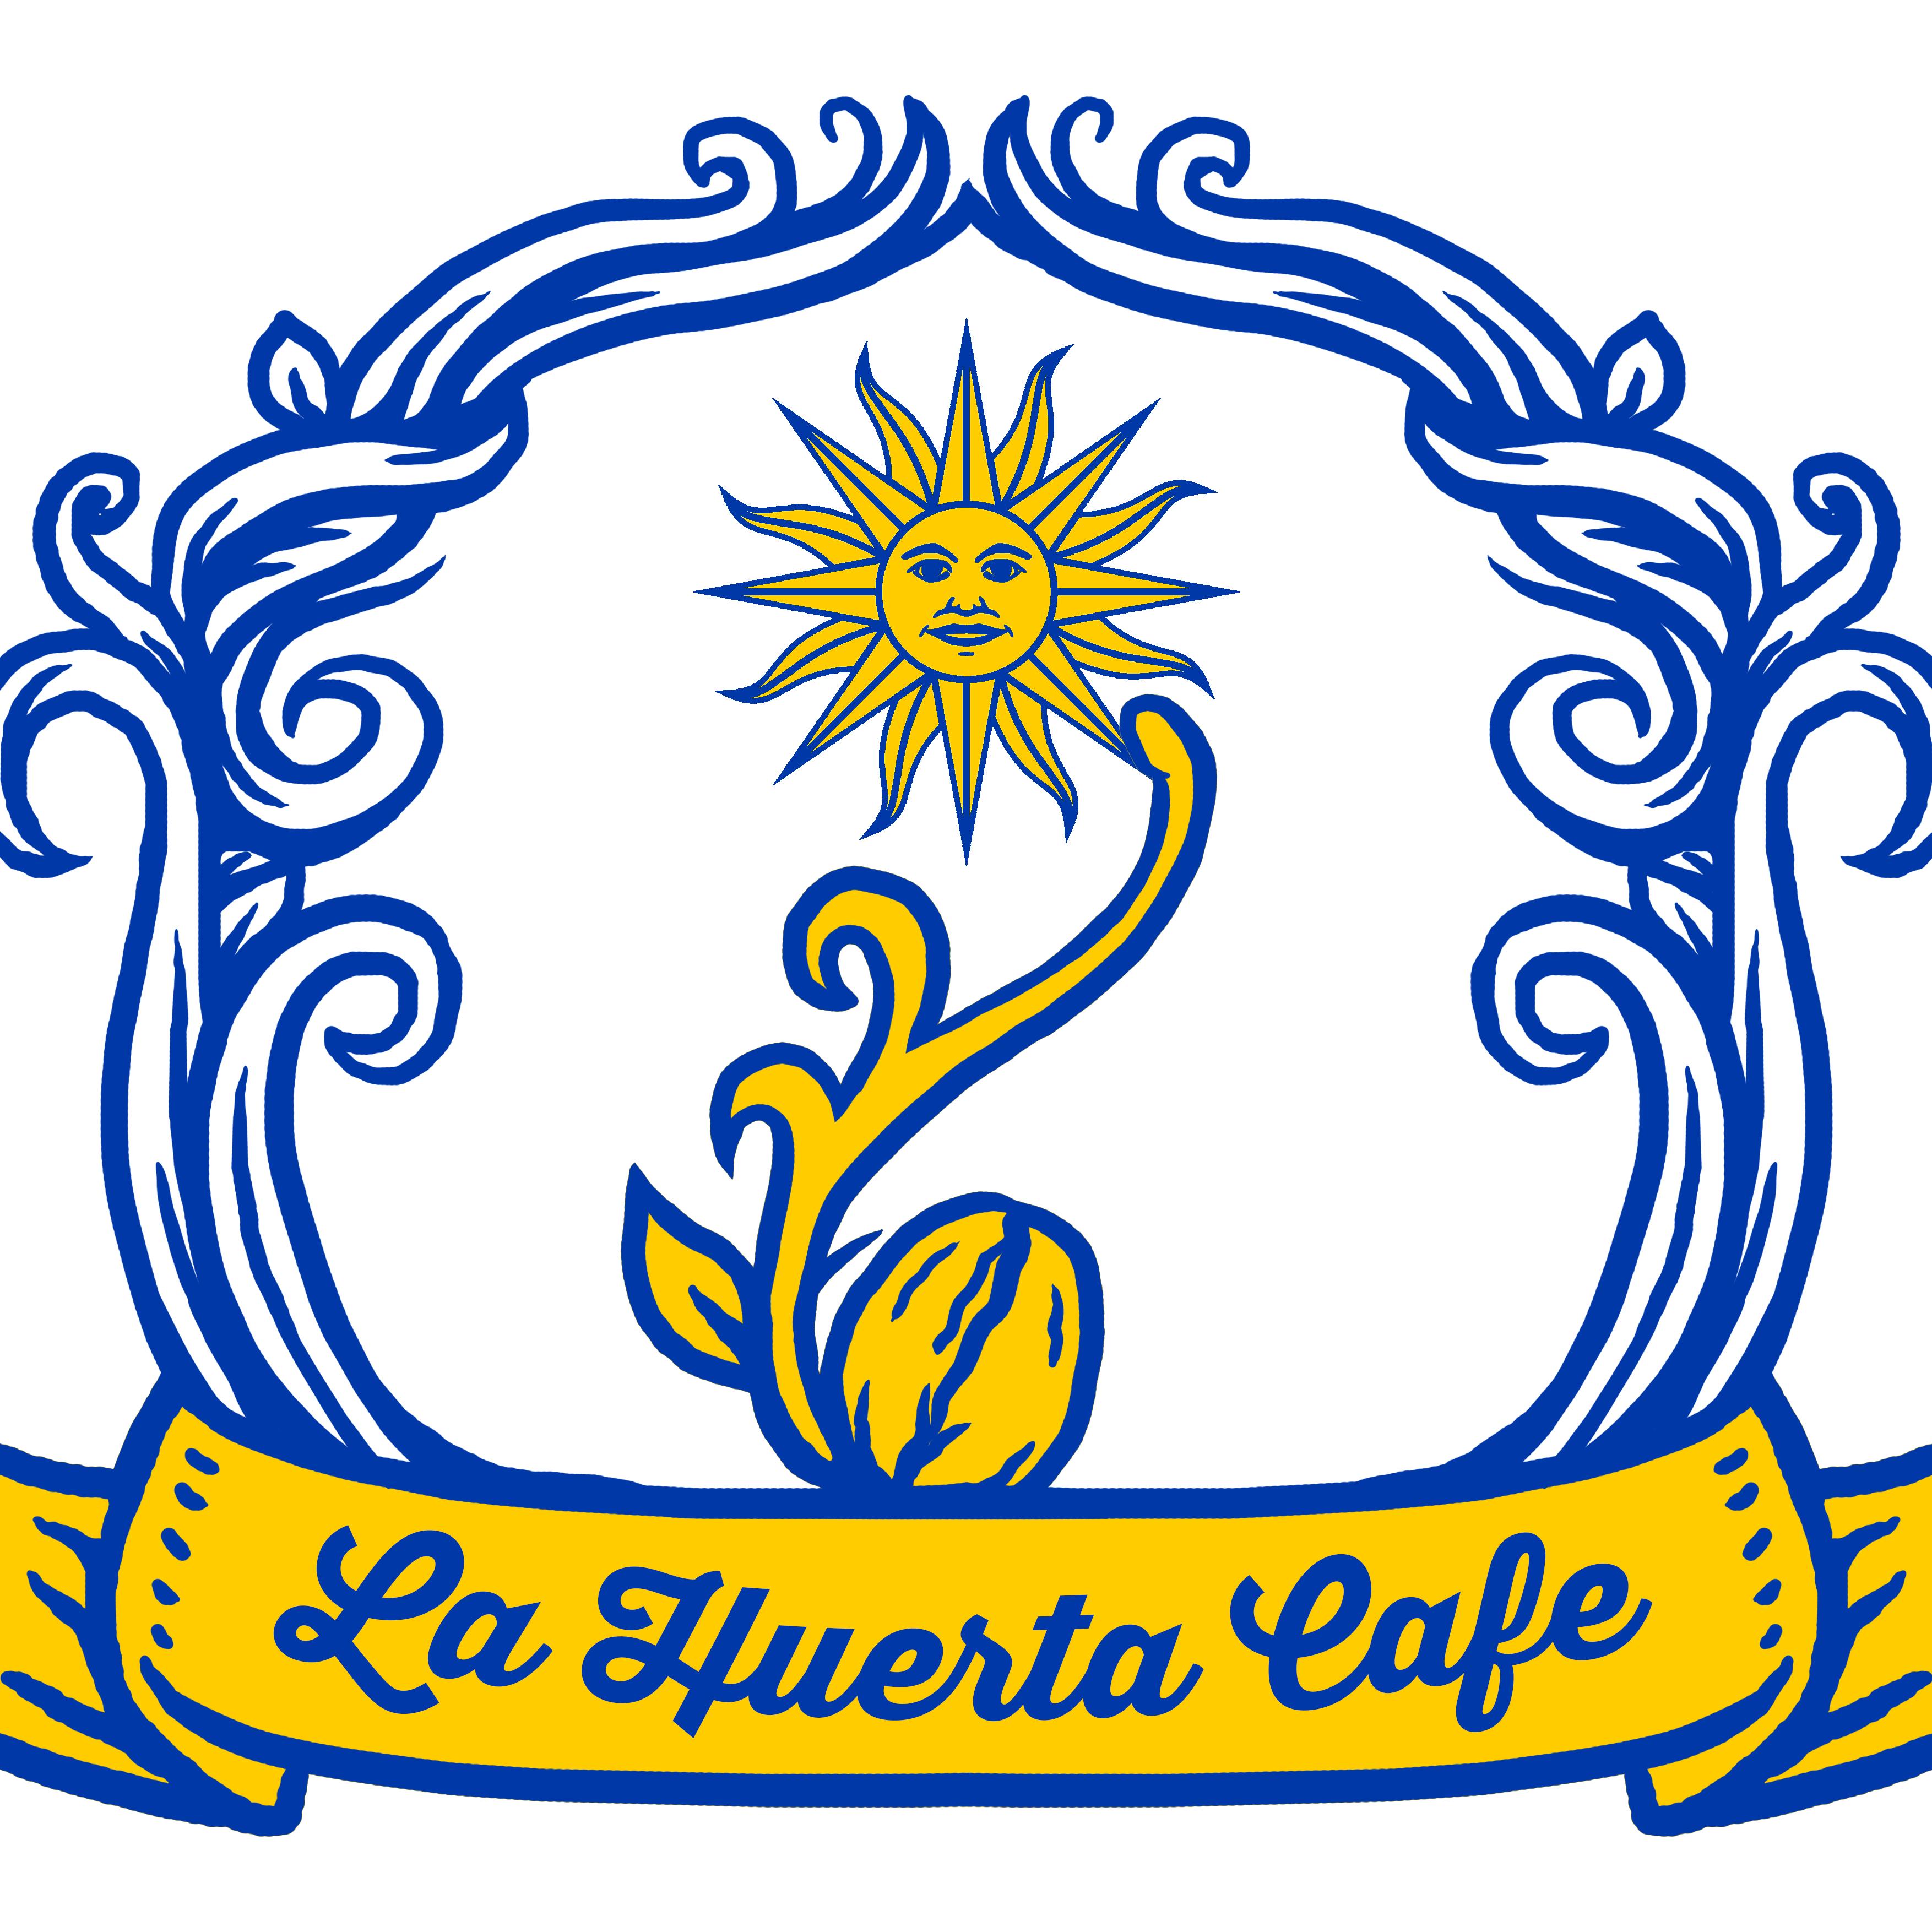 La Huerta Cafe